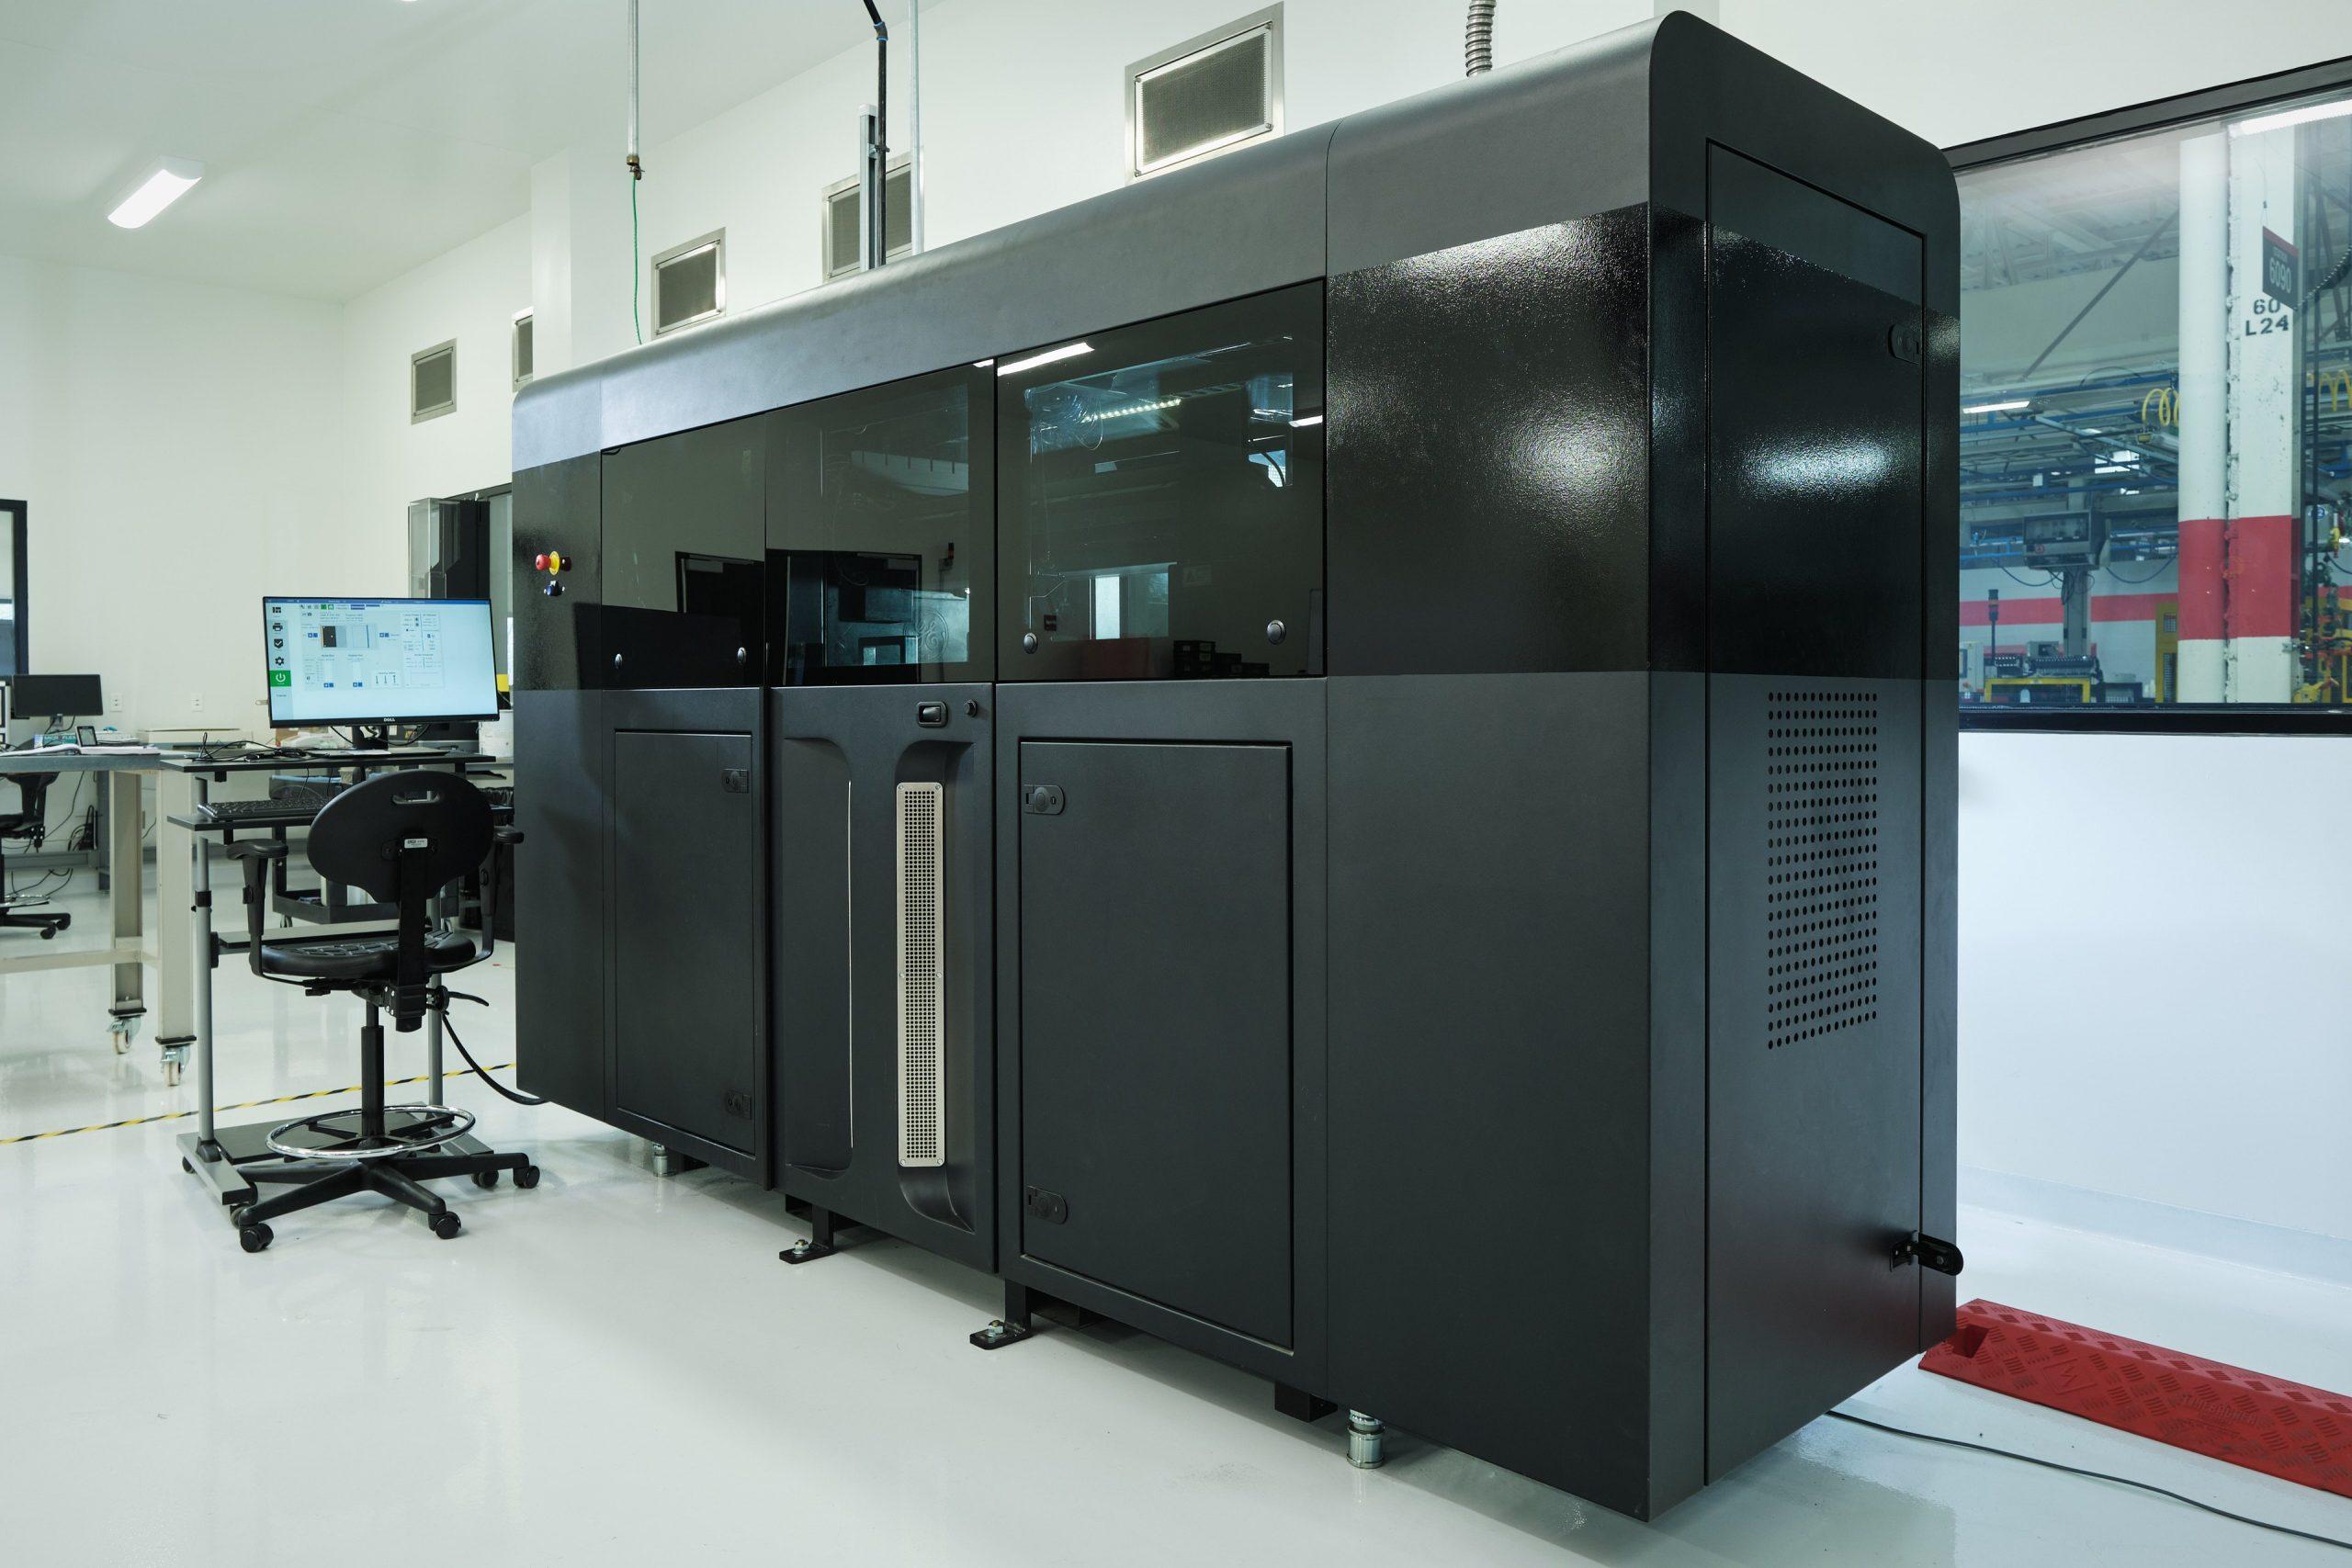 The H2 Binder Jet 3D printer from GE Additive installed at Cummins' facility. Photo via Cummins Inc.